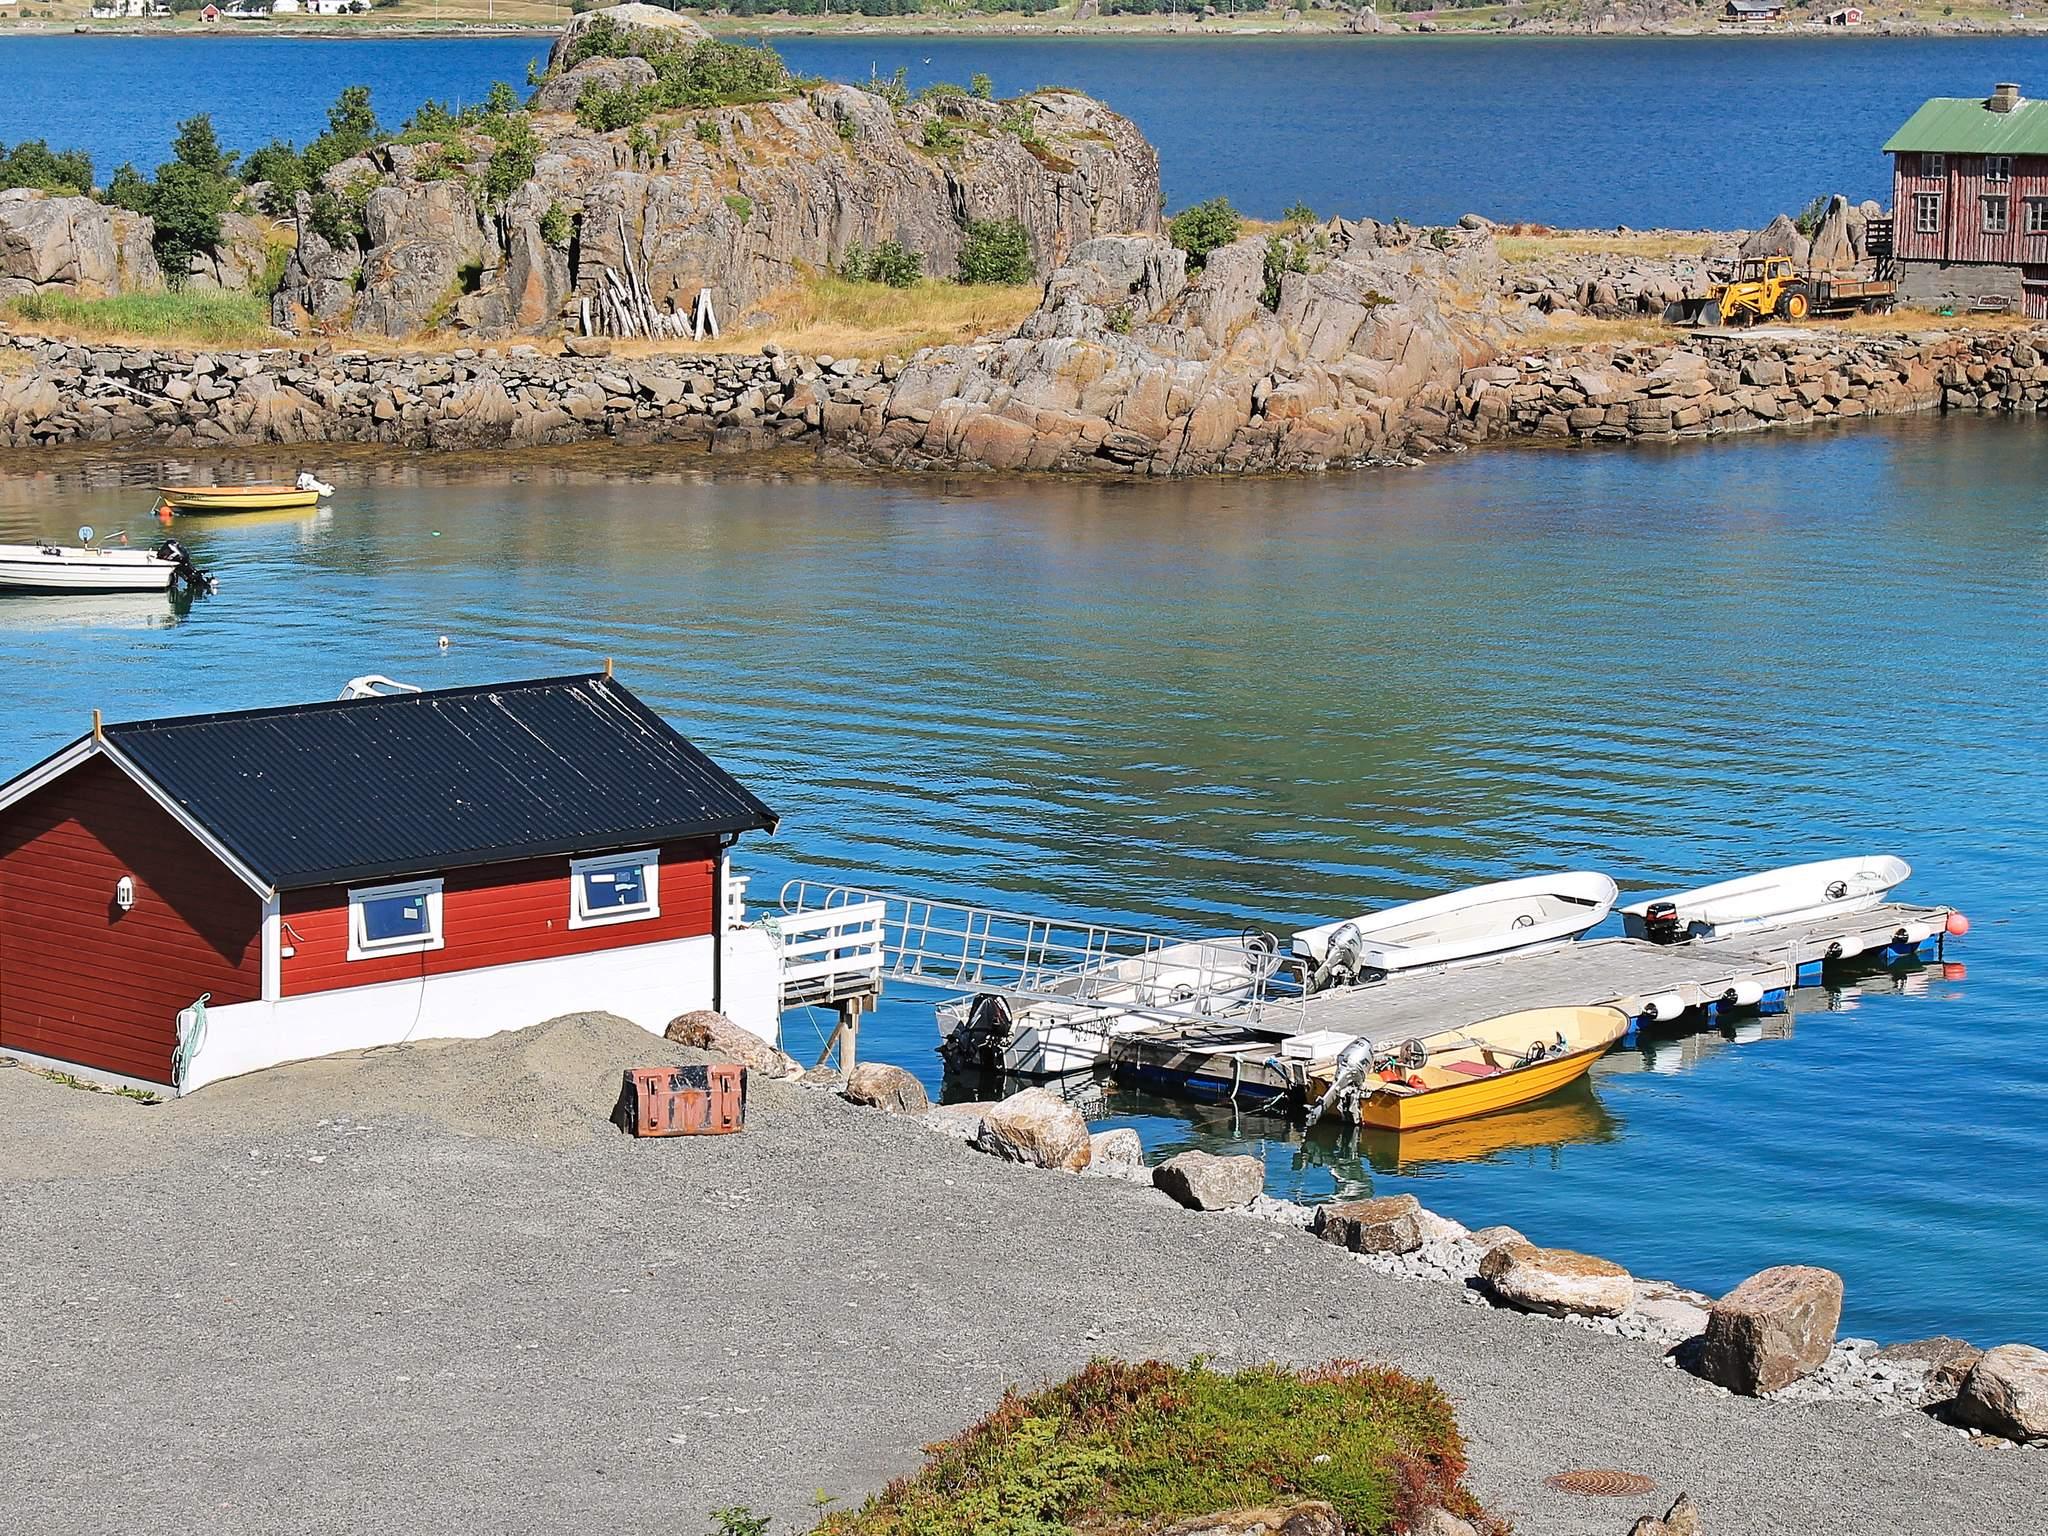 Ferienhaus Lofoten (439553), Sennesvik, , Nordnorwegen, Norwegen, Bild 18